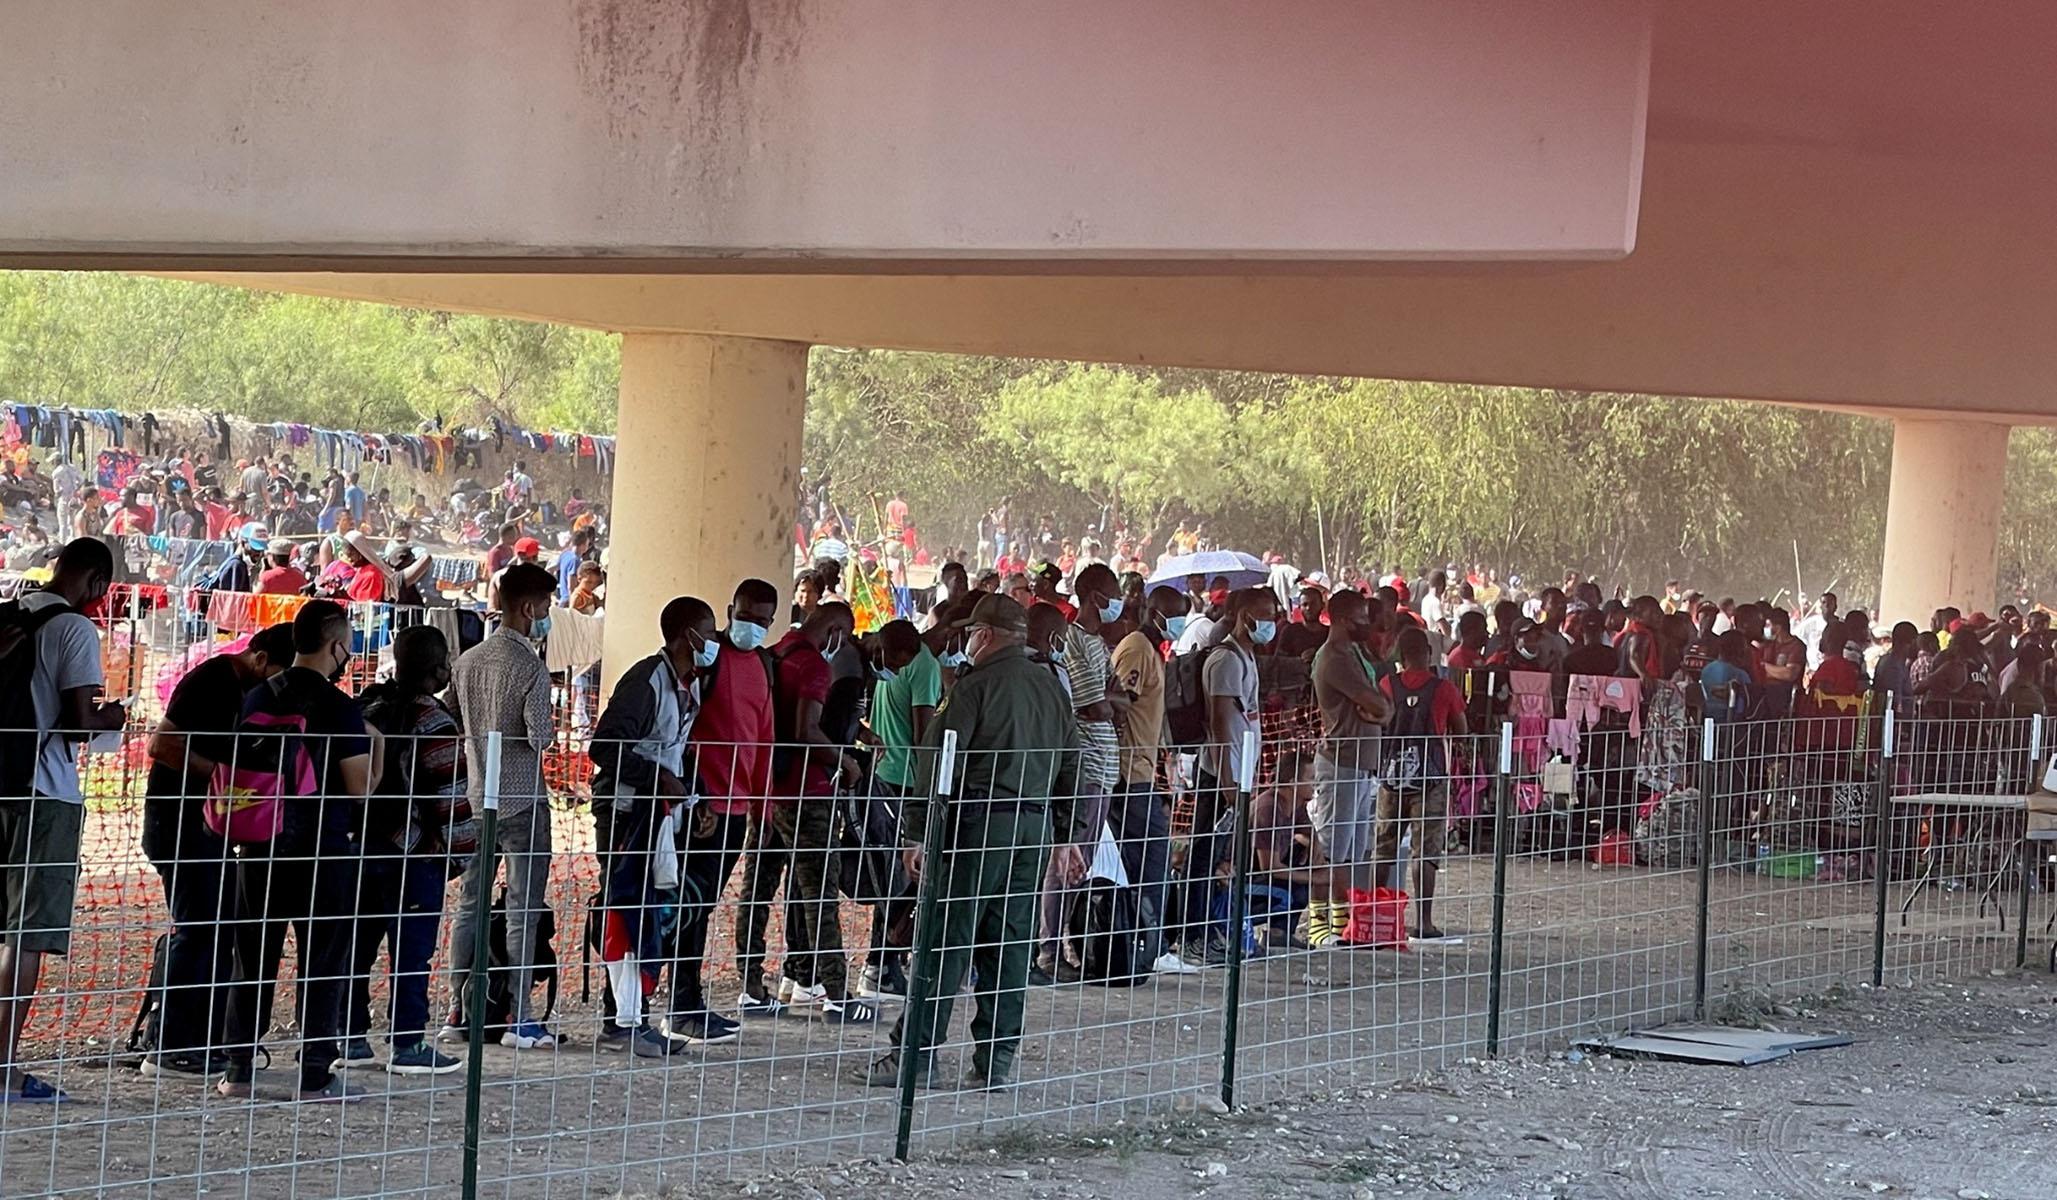 Texas Mayor Urges Biden to Address Massive Migrant Camp Forming under Local Bridge